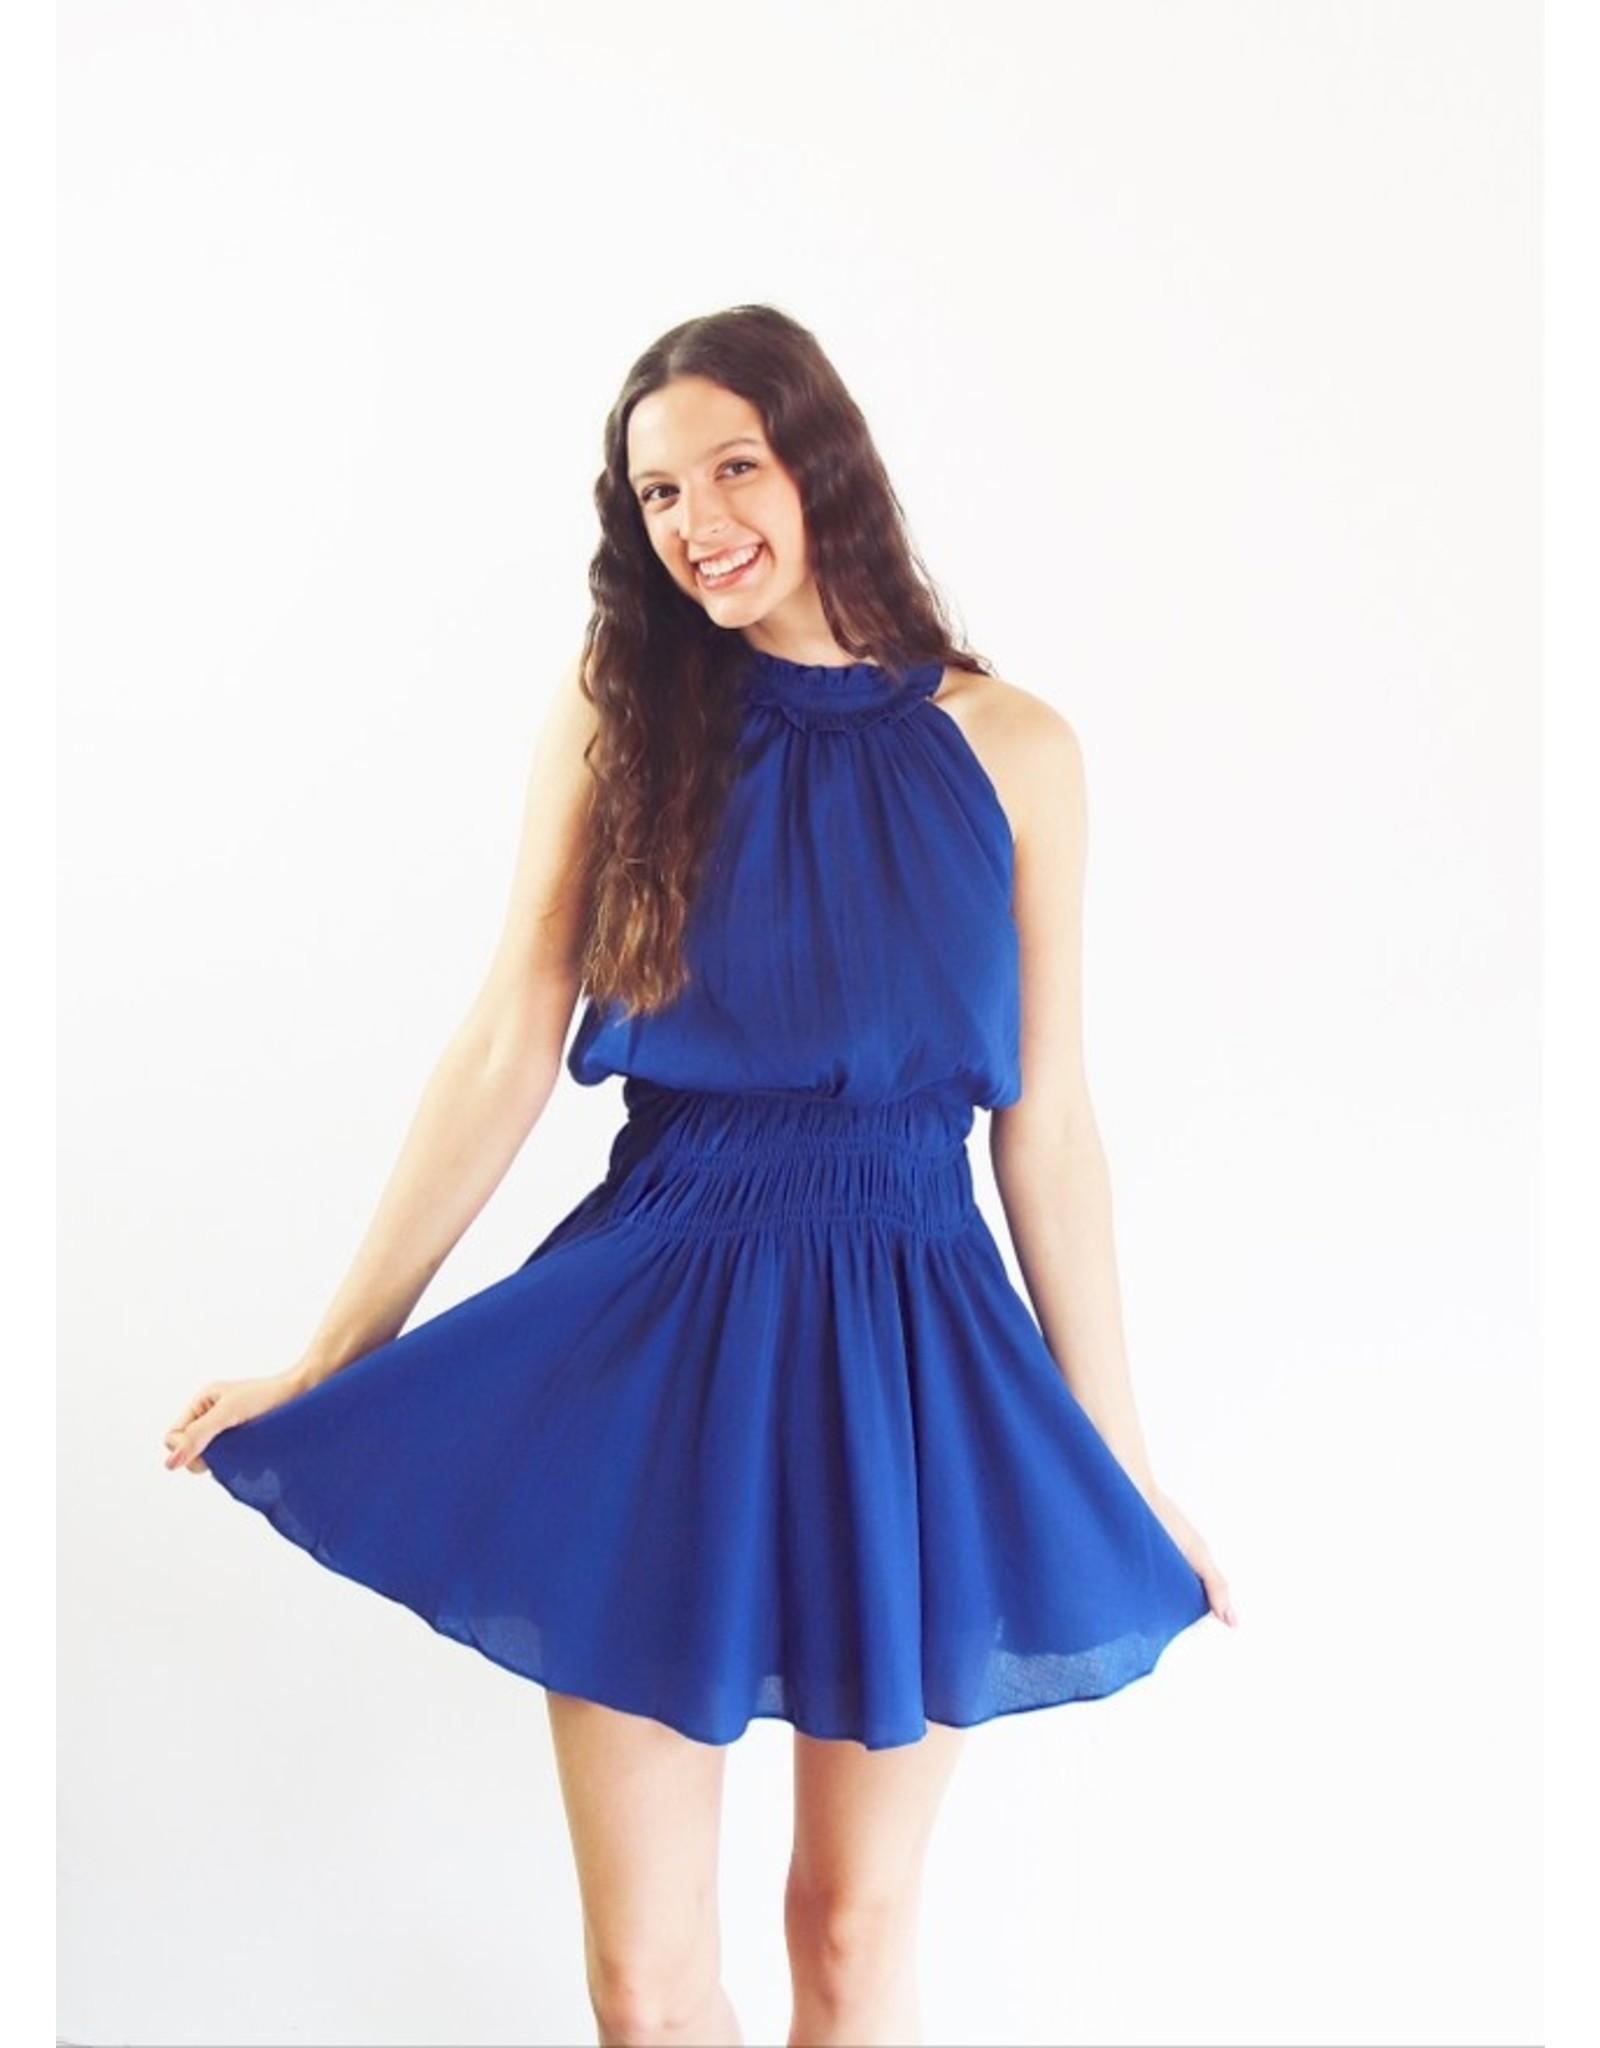 GIANNA HALTER TOP DRESS